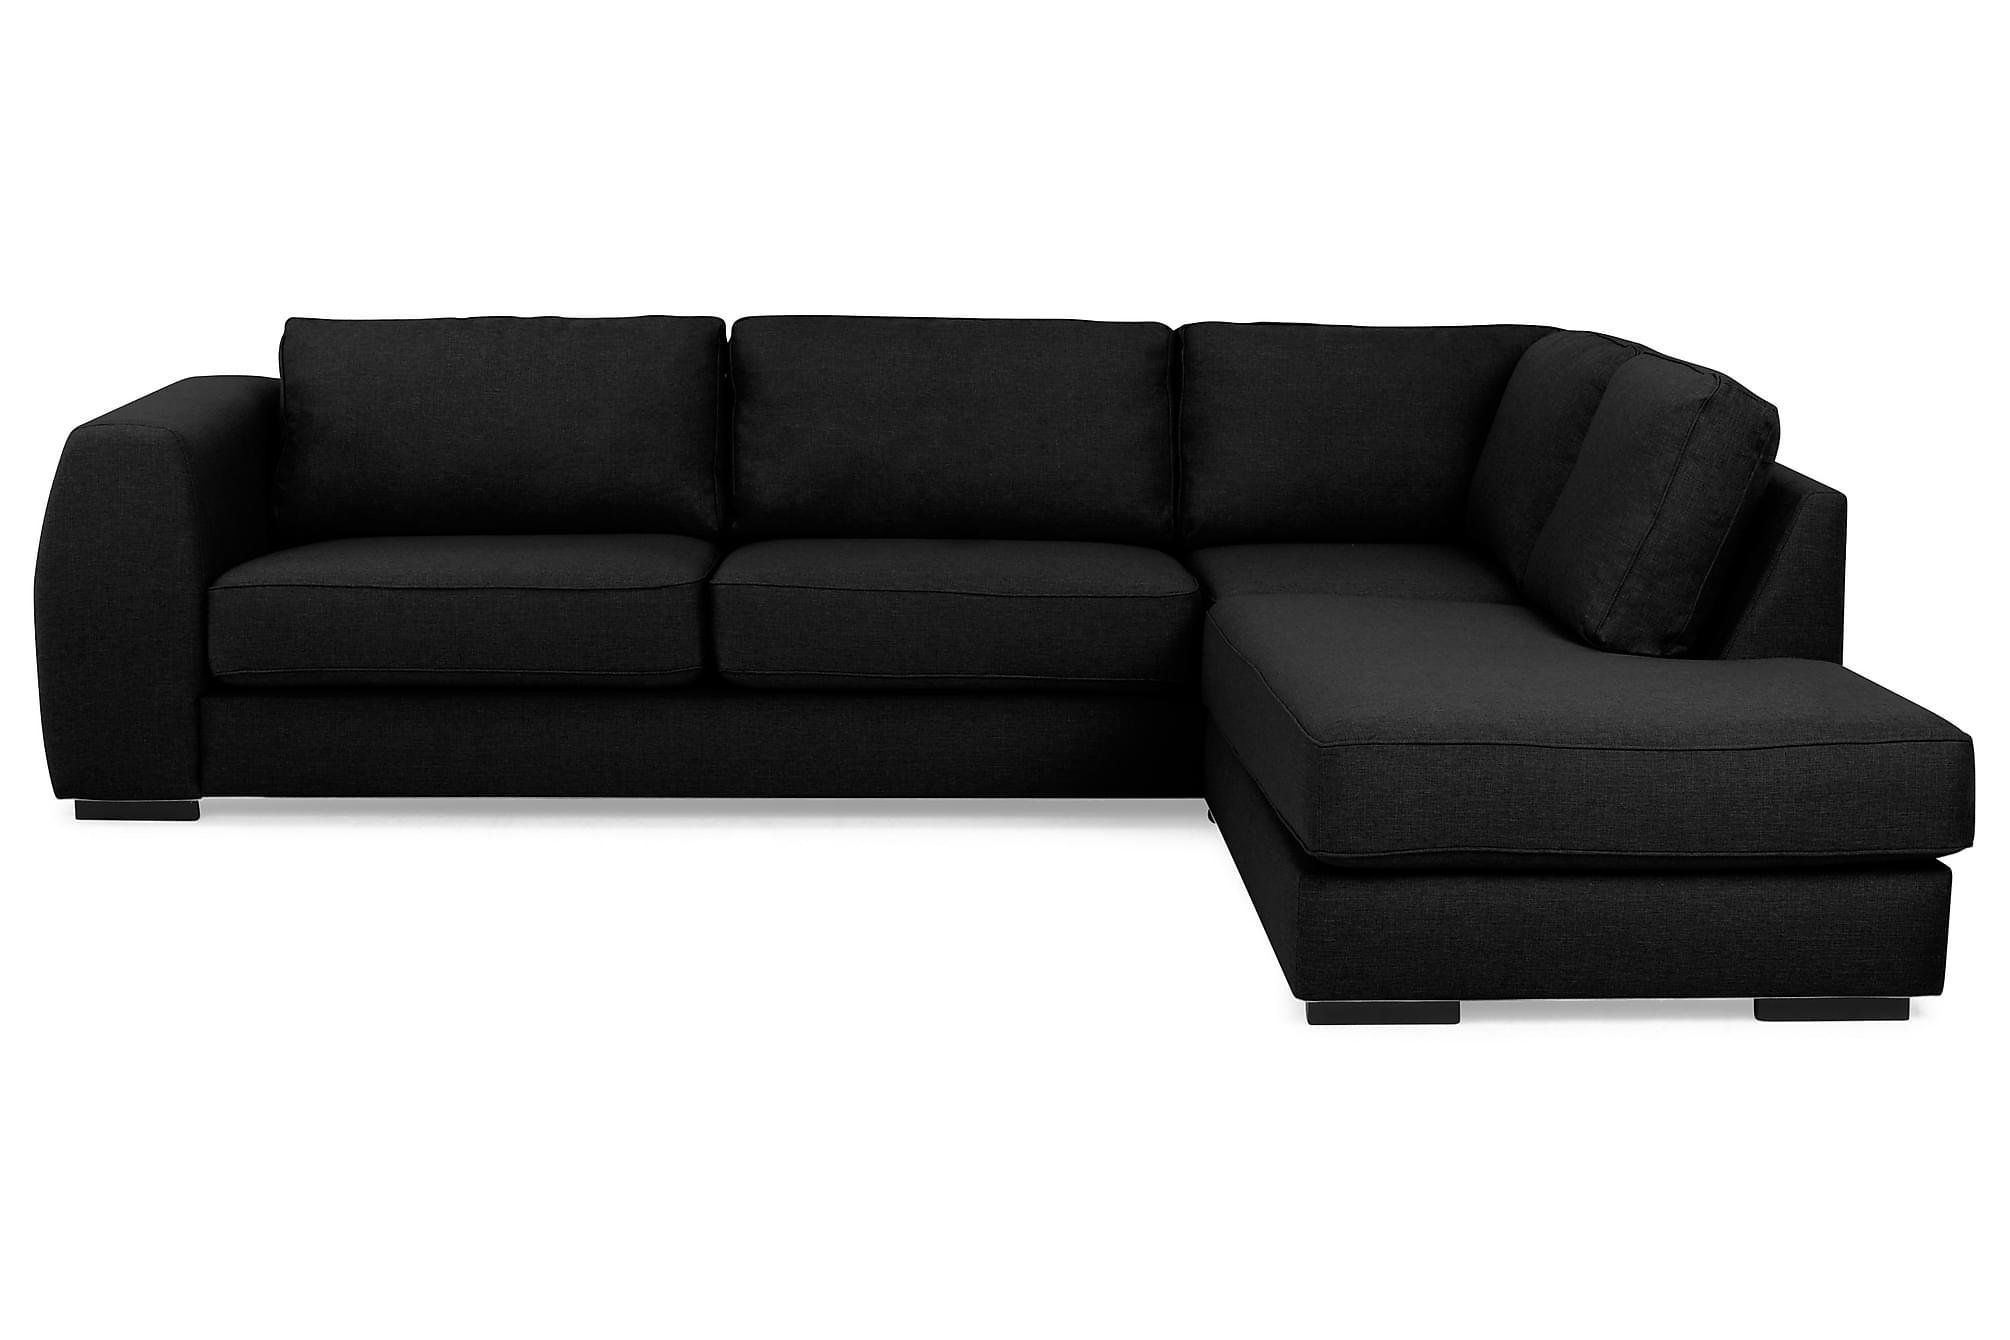 Clarkville 3-sits soffa med schäslong höger svart